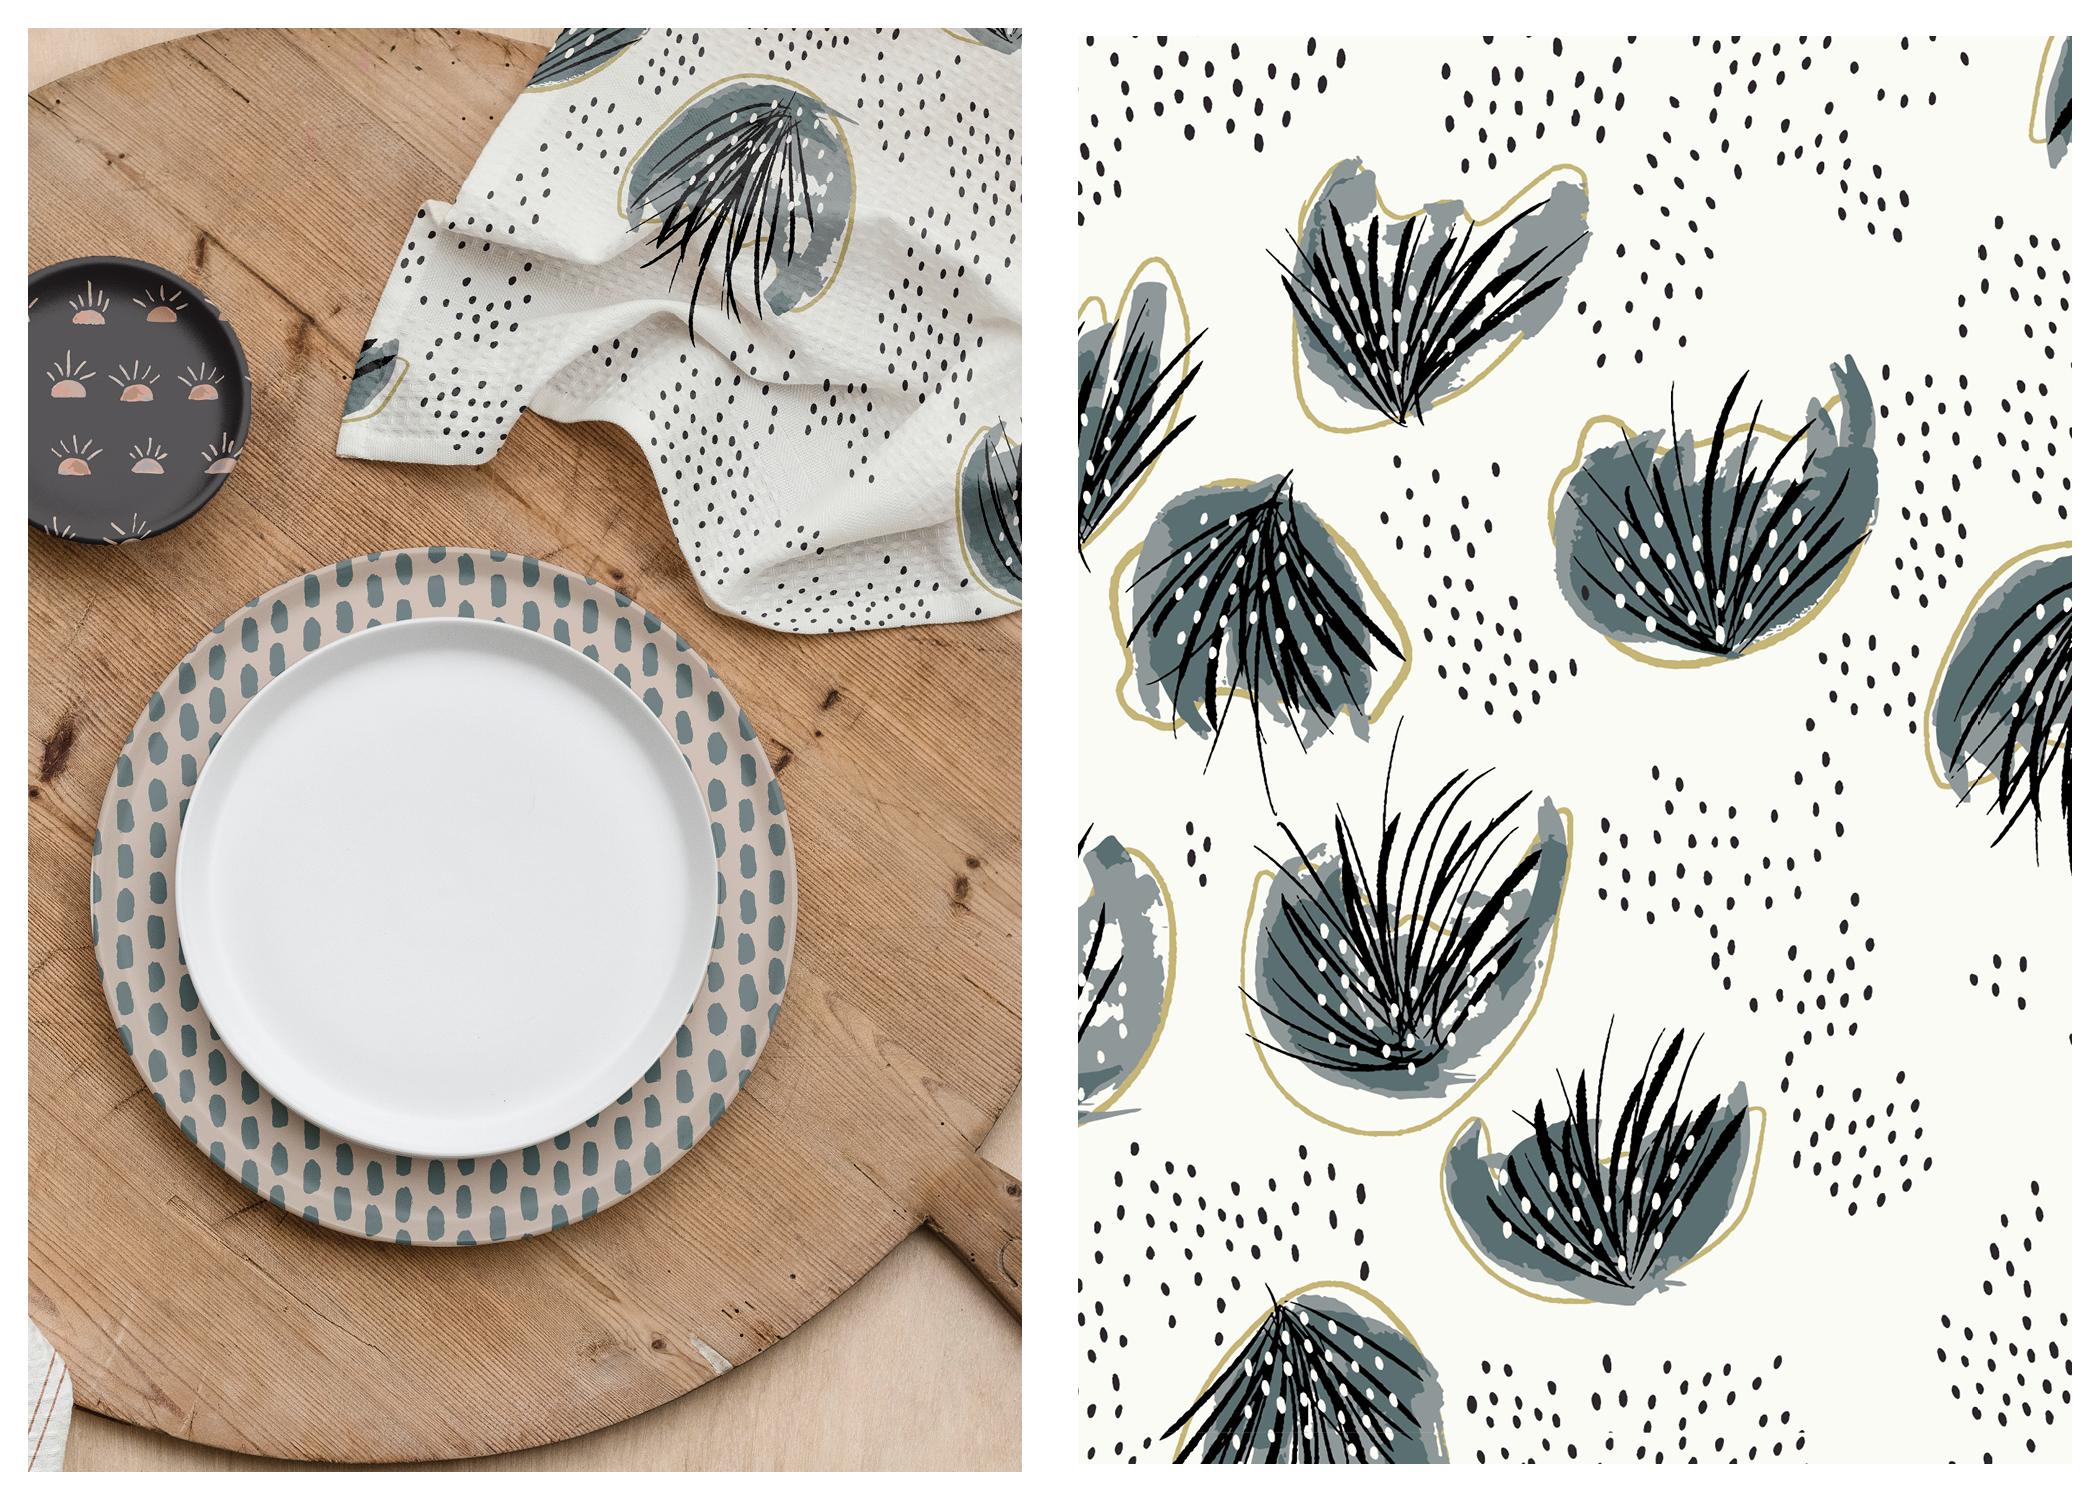 surface pattern design by HOPE johnson6.jpg